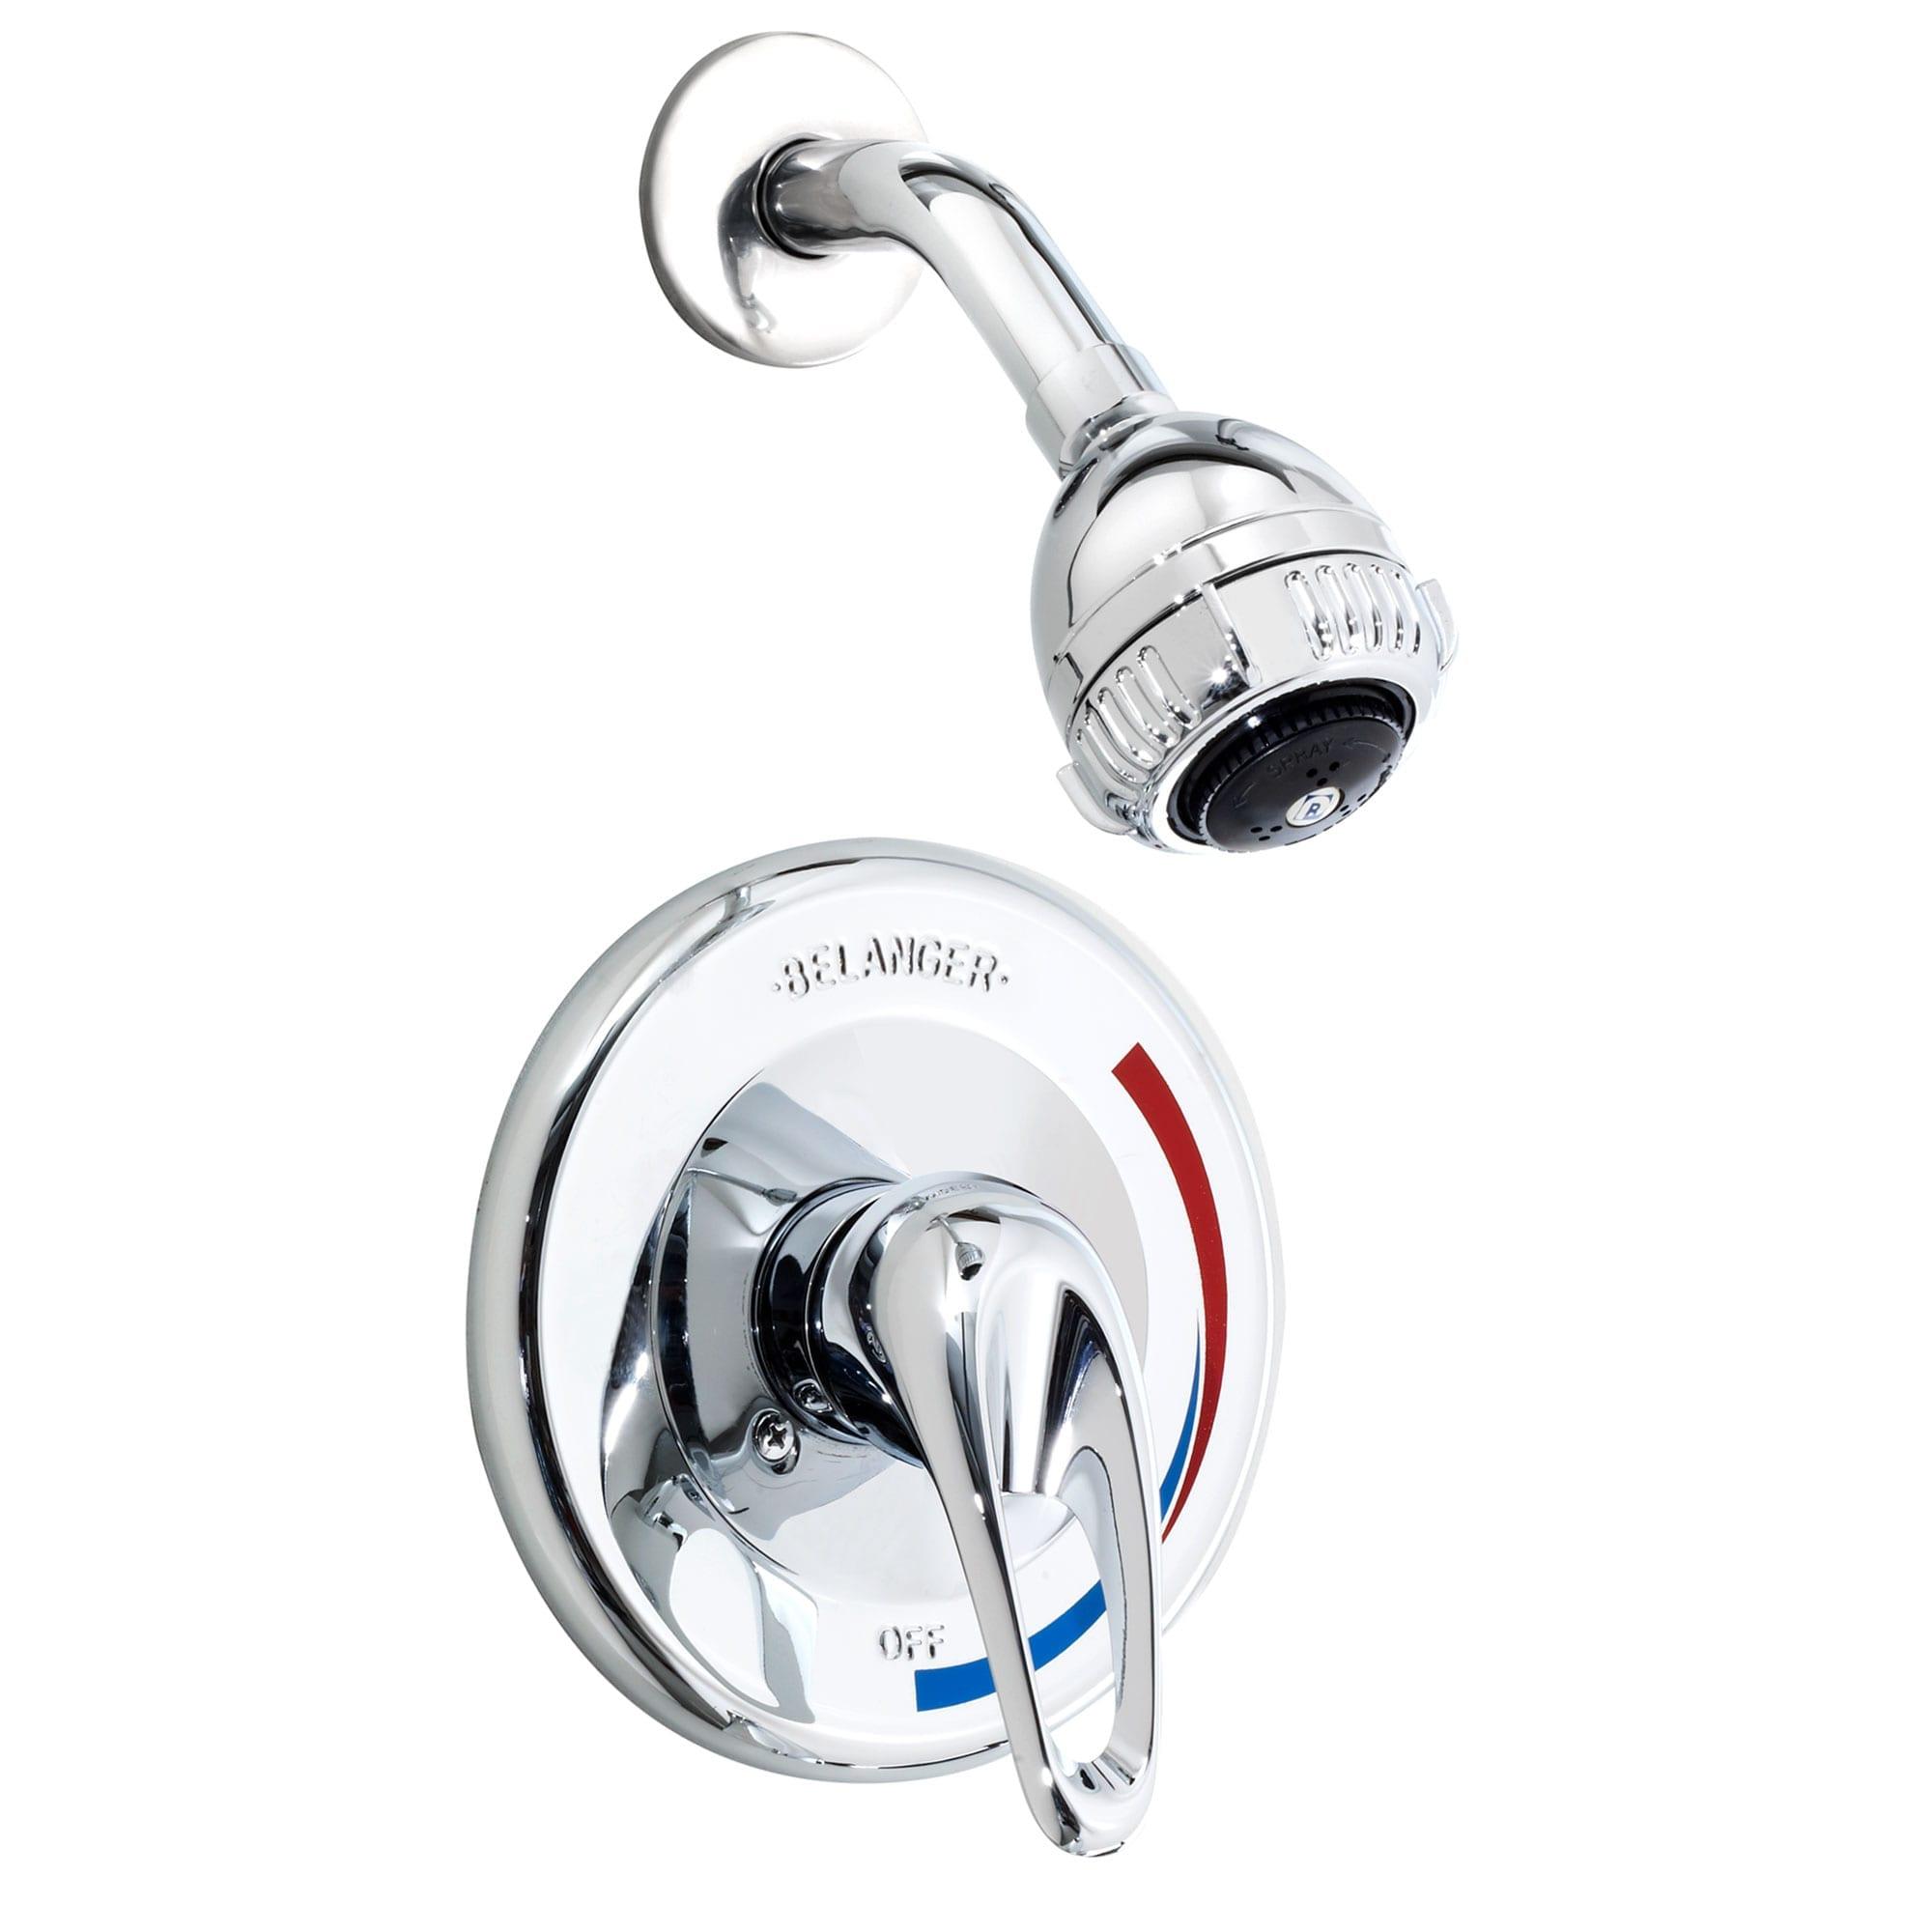 robinet pour douche garniture pour valve pression quilibr e b langer upt. Black Bedroom Furniture Sets. Home Design Ideas